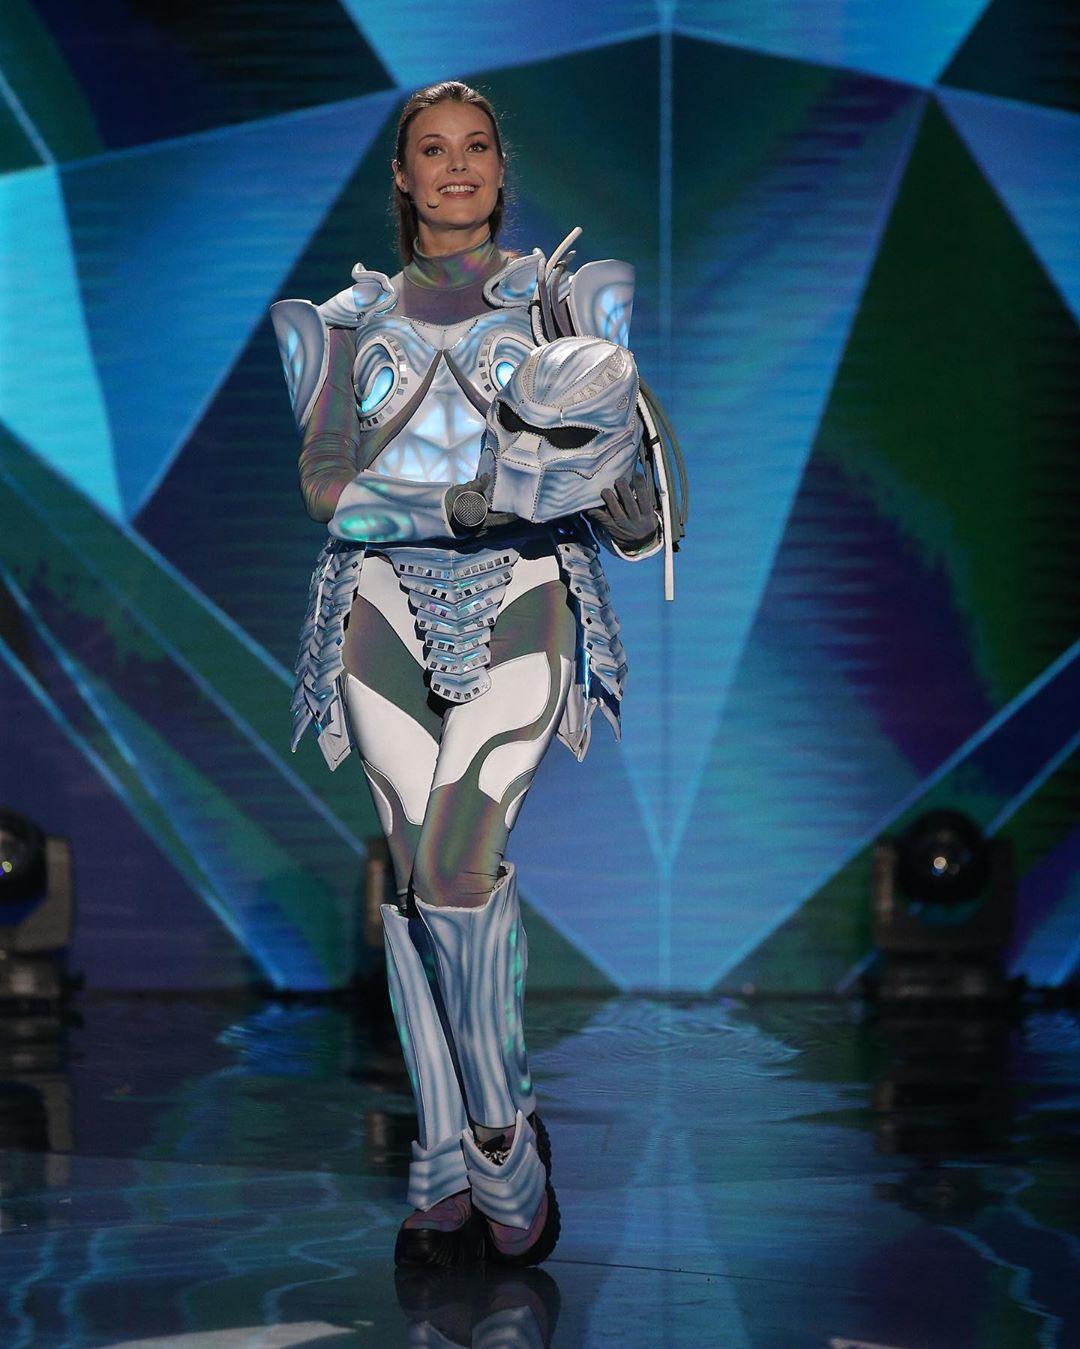 Оксана Федорова в костюме робота